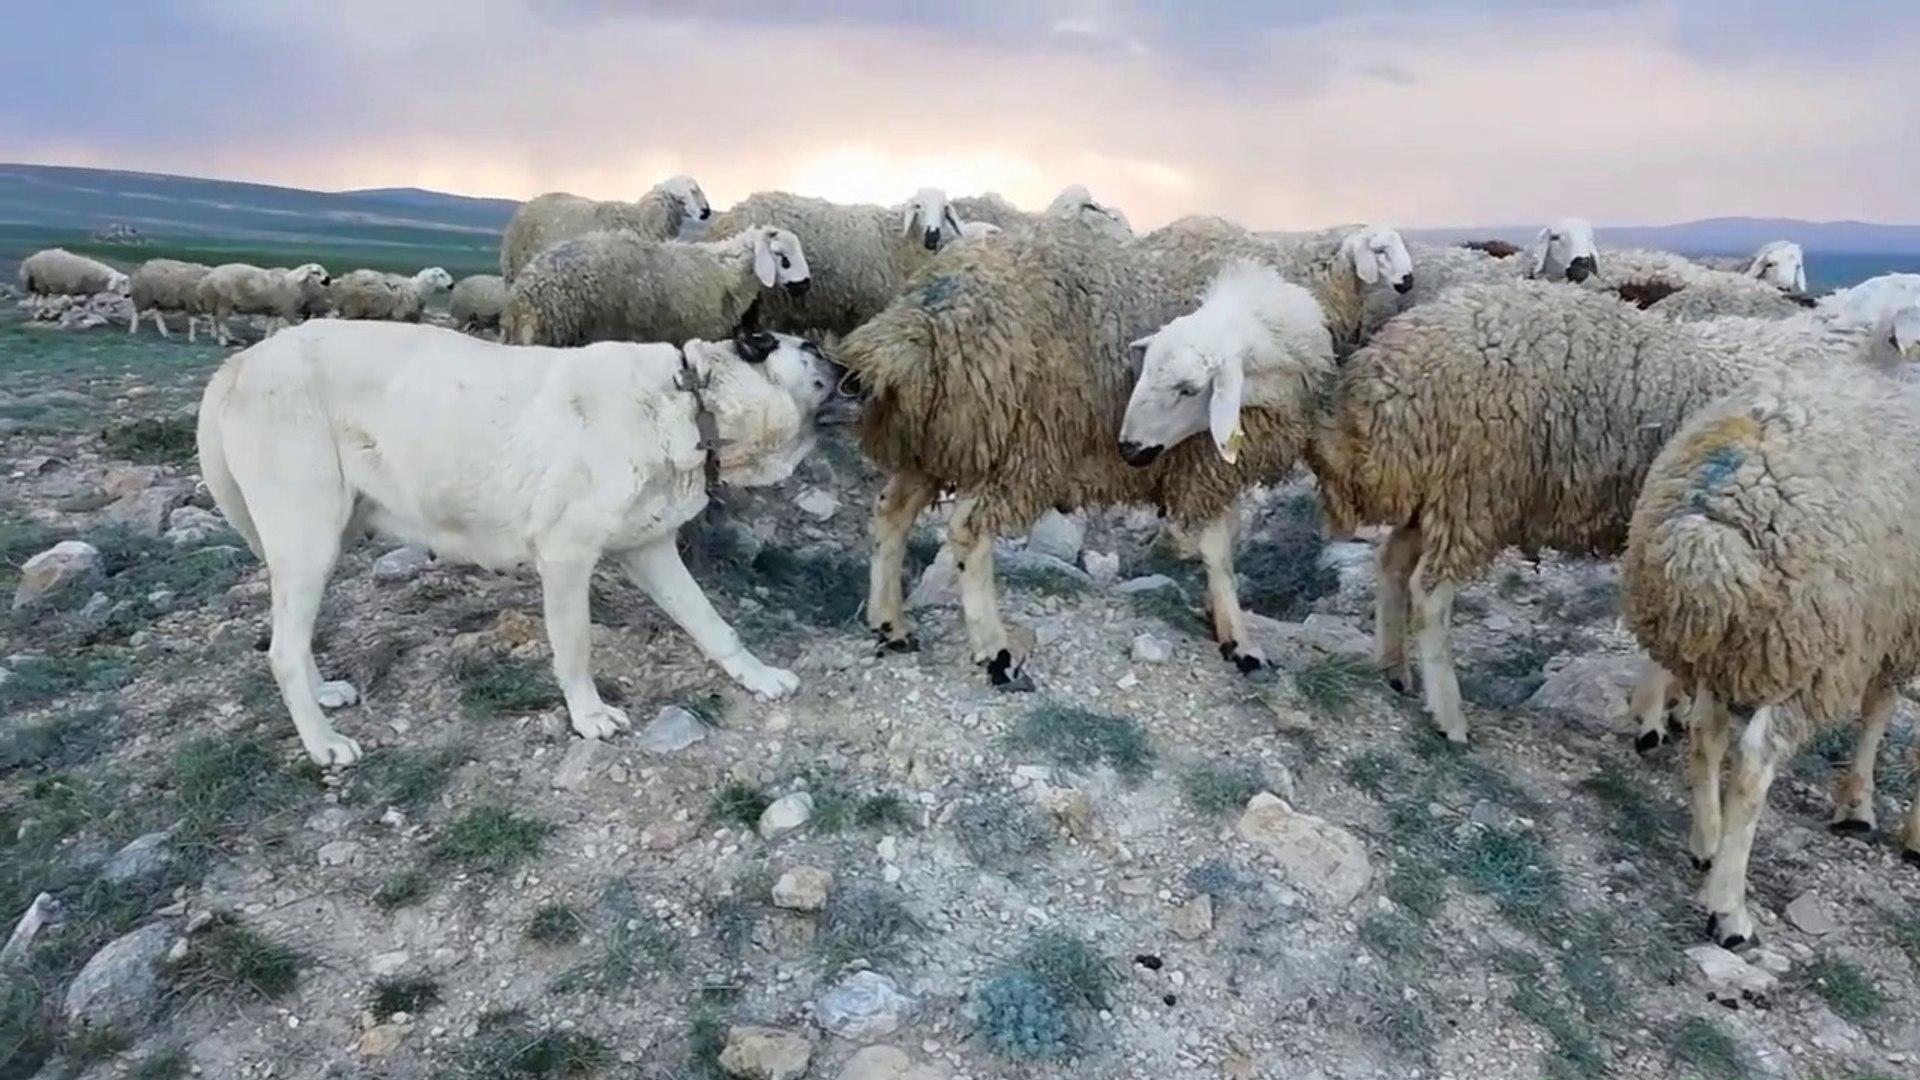 SiVAS KANGAL KOPEGiNiN KOYUN SURUSU için OZVERiSi - KaNGAL SHEPHERD DOG FLEA CLEANiNG